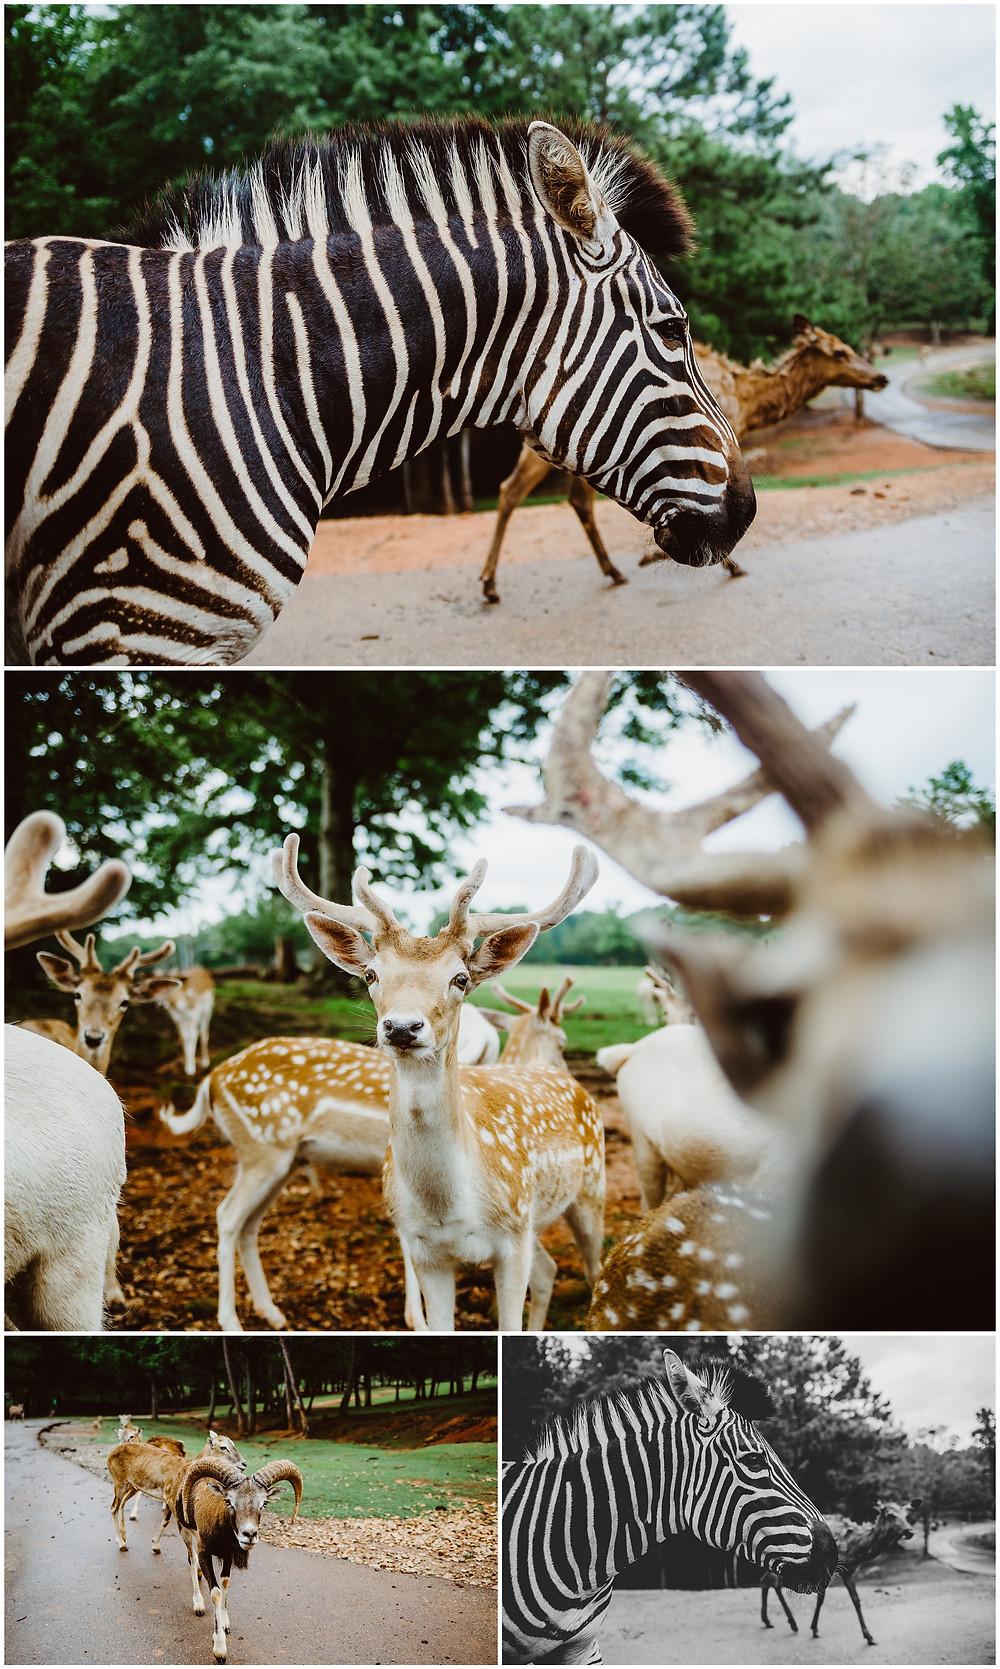 Wild Animal Safari, Georgia, Travel Photography, Zebra